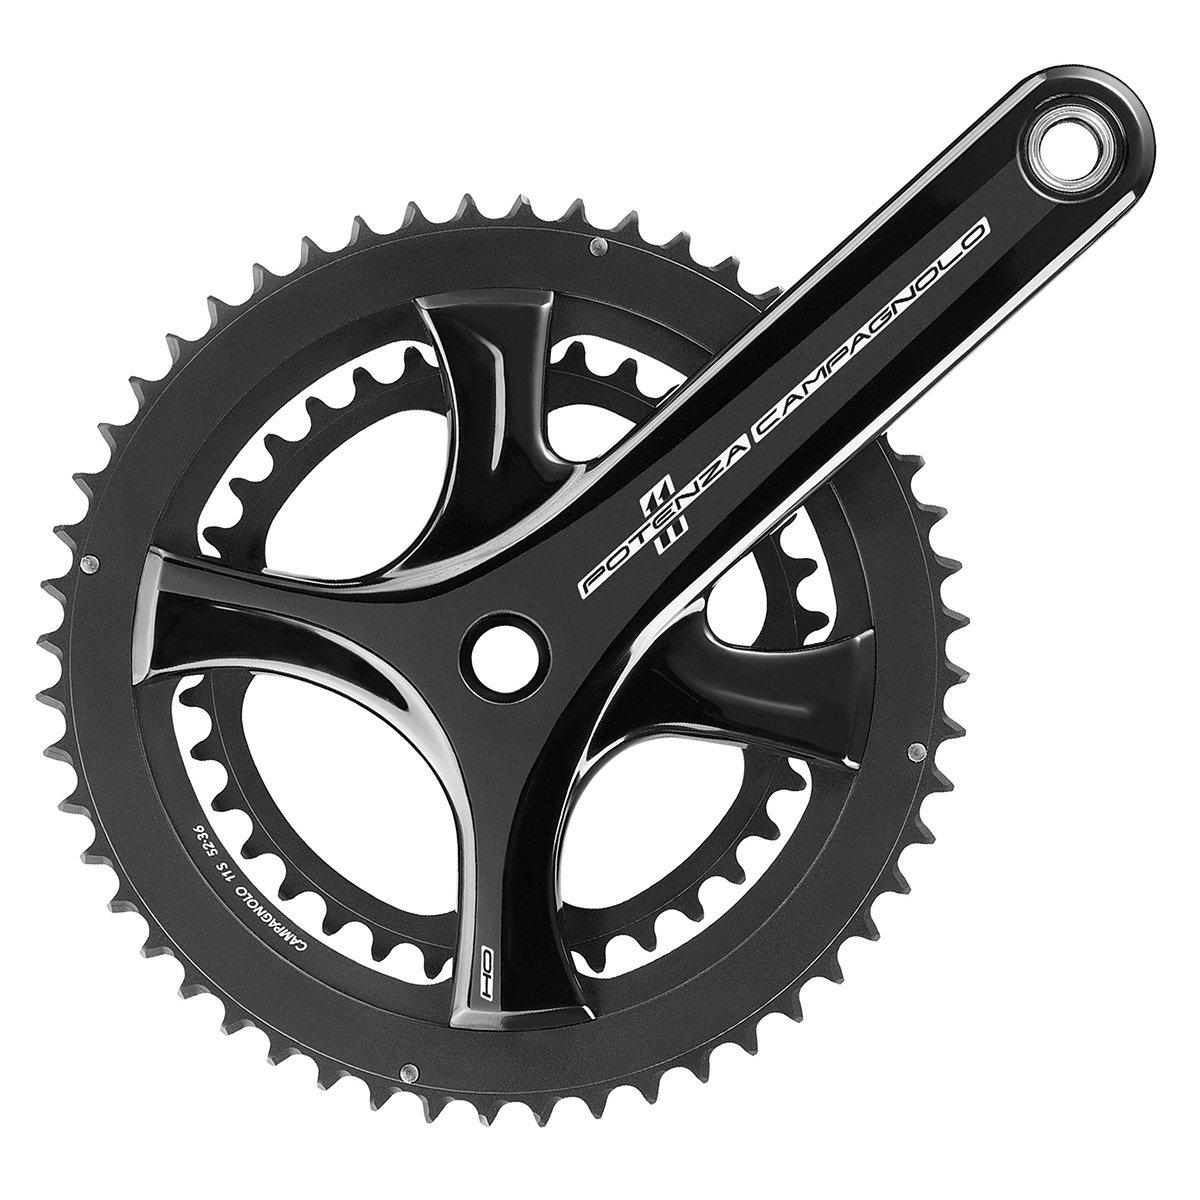 Campagnolo Potenza Ho UT 11-speed自転車Crankset – fc18-po B073116H8B 170x34/50(FC18-PO040)|ブラック ブラック 170x34/50(FC18-PO040)